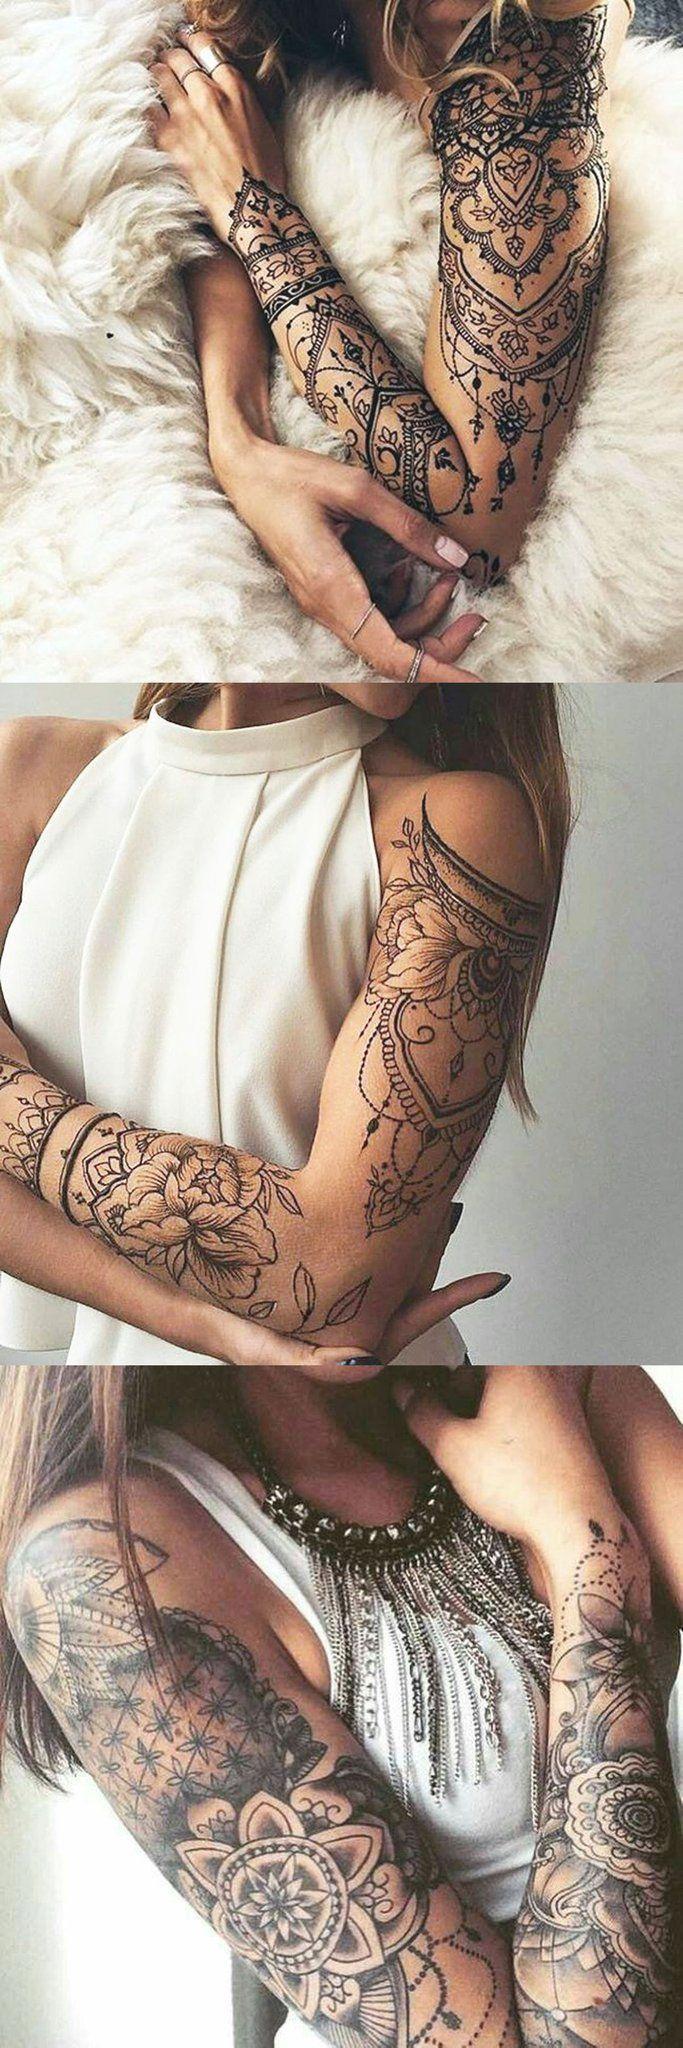 Lotus Arm Sleeve Tattoo Ideas for Women at MyBodiArt.com – Tribal Mandala Arm B …